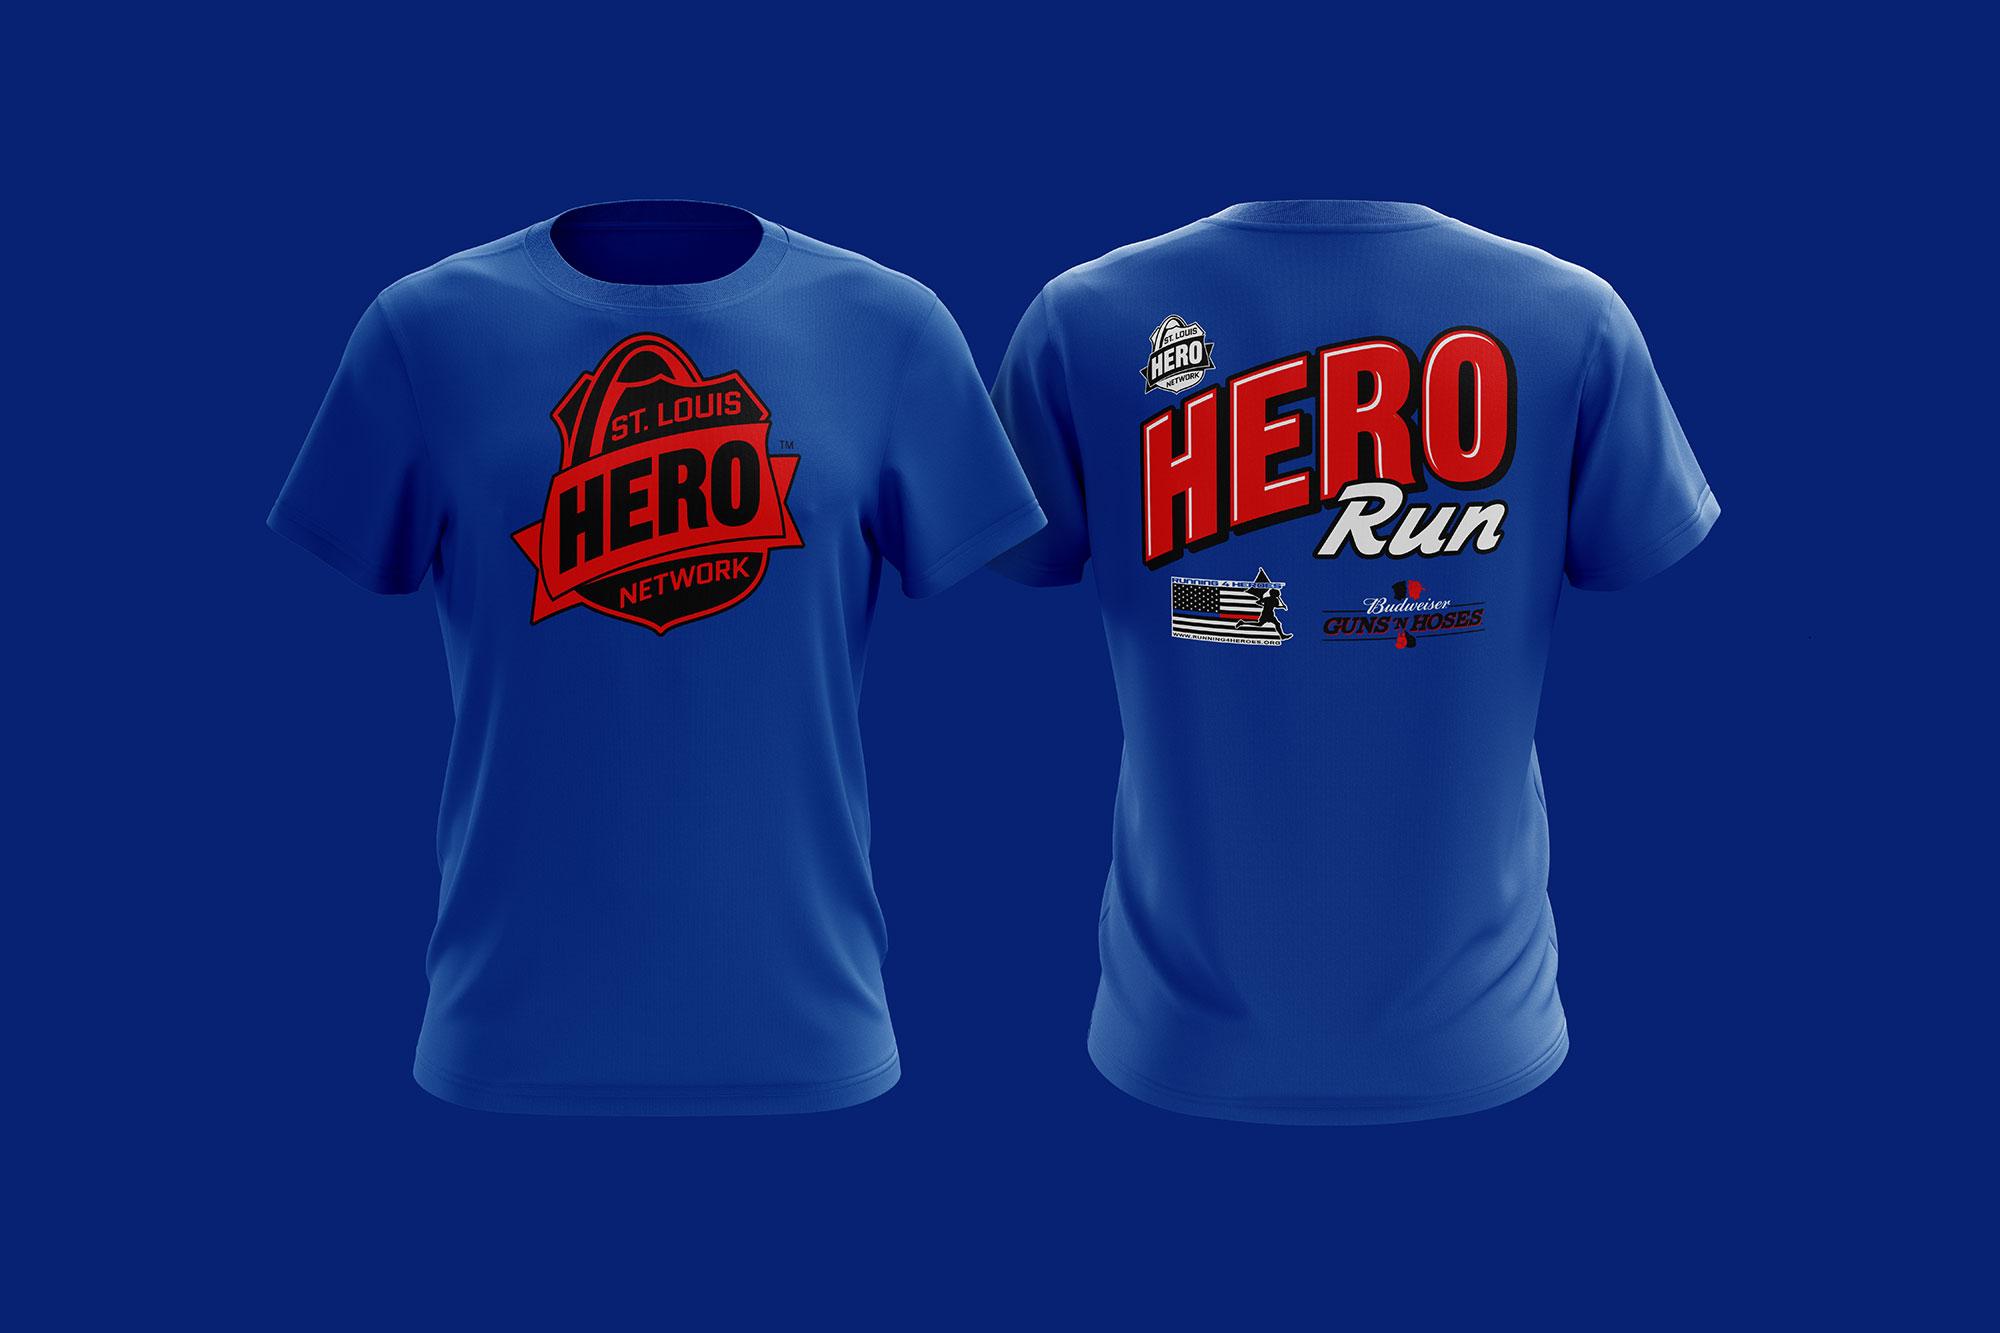 STL Hero Run shirt design